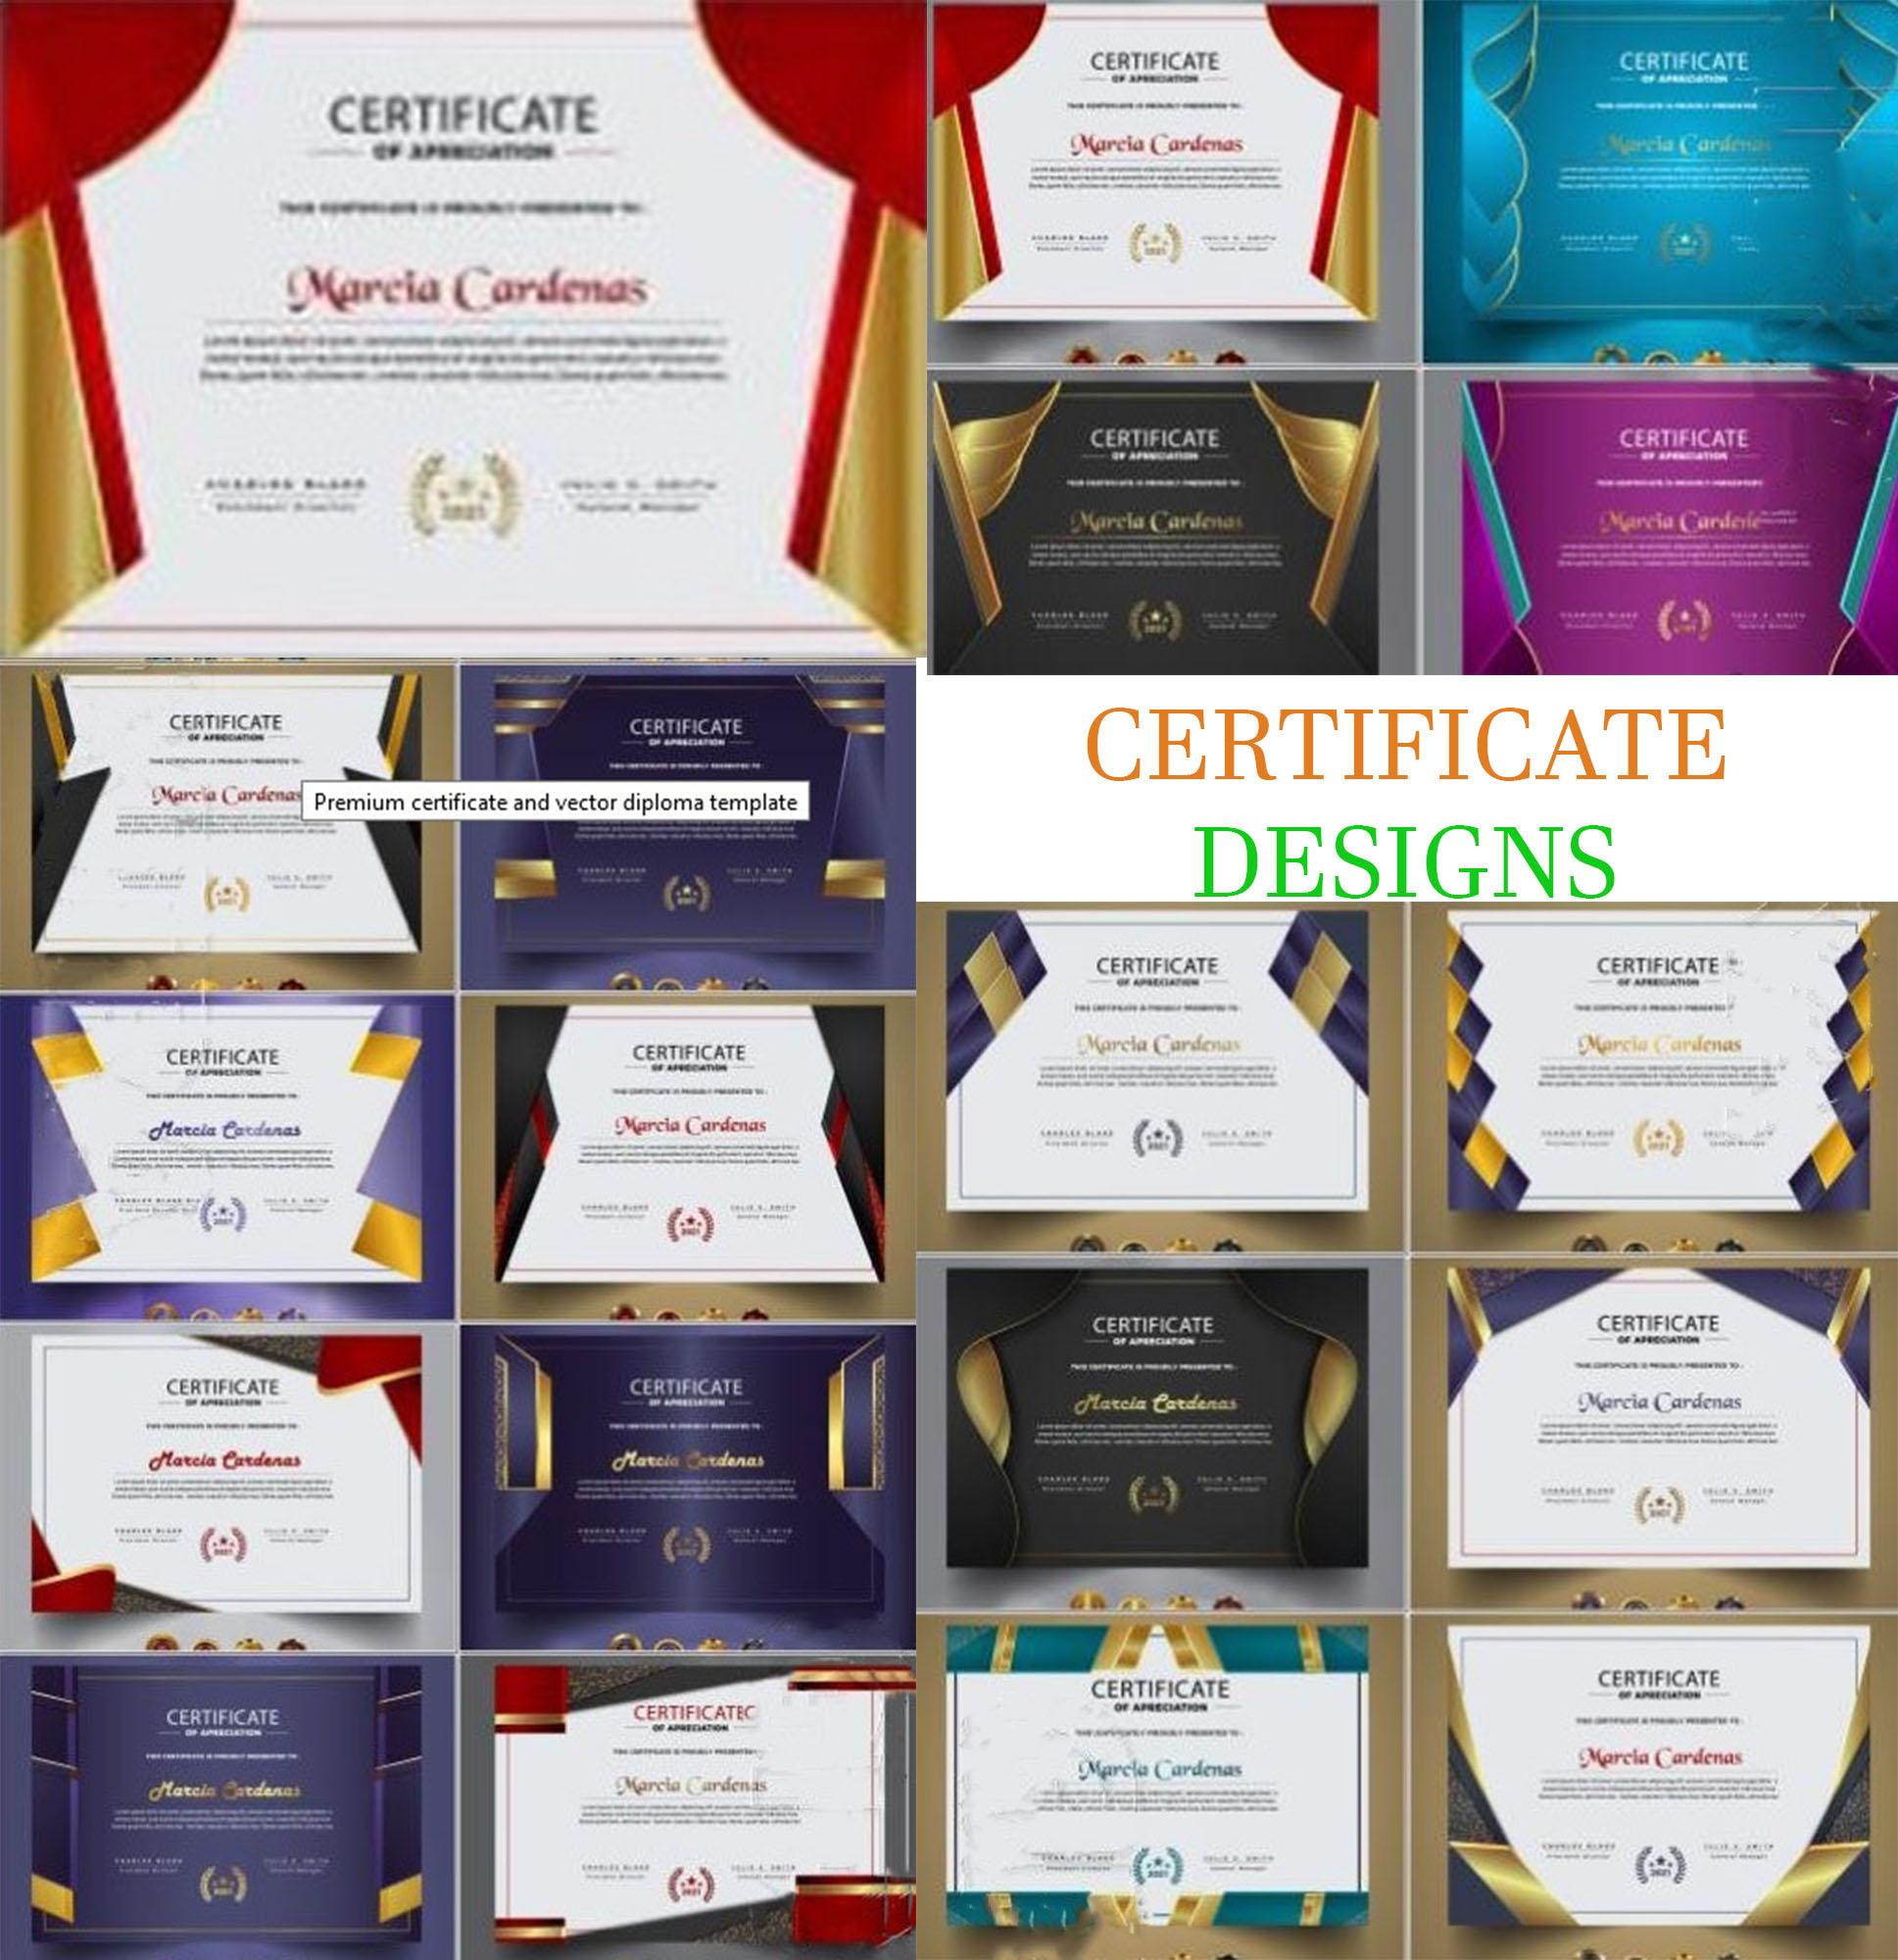 Creative premium certificate and vector diploma template, Editing certificate